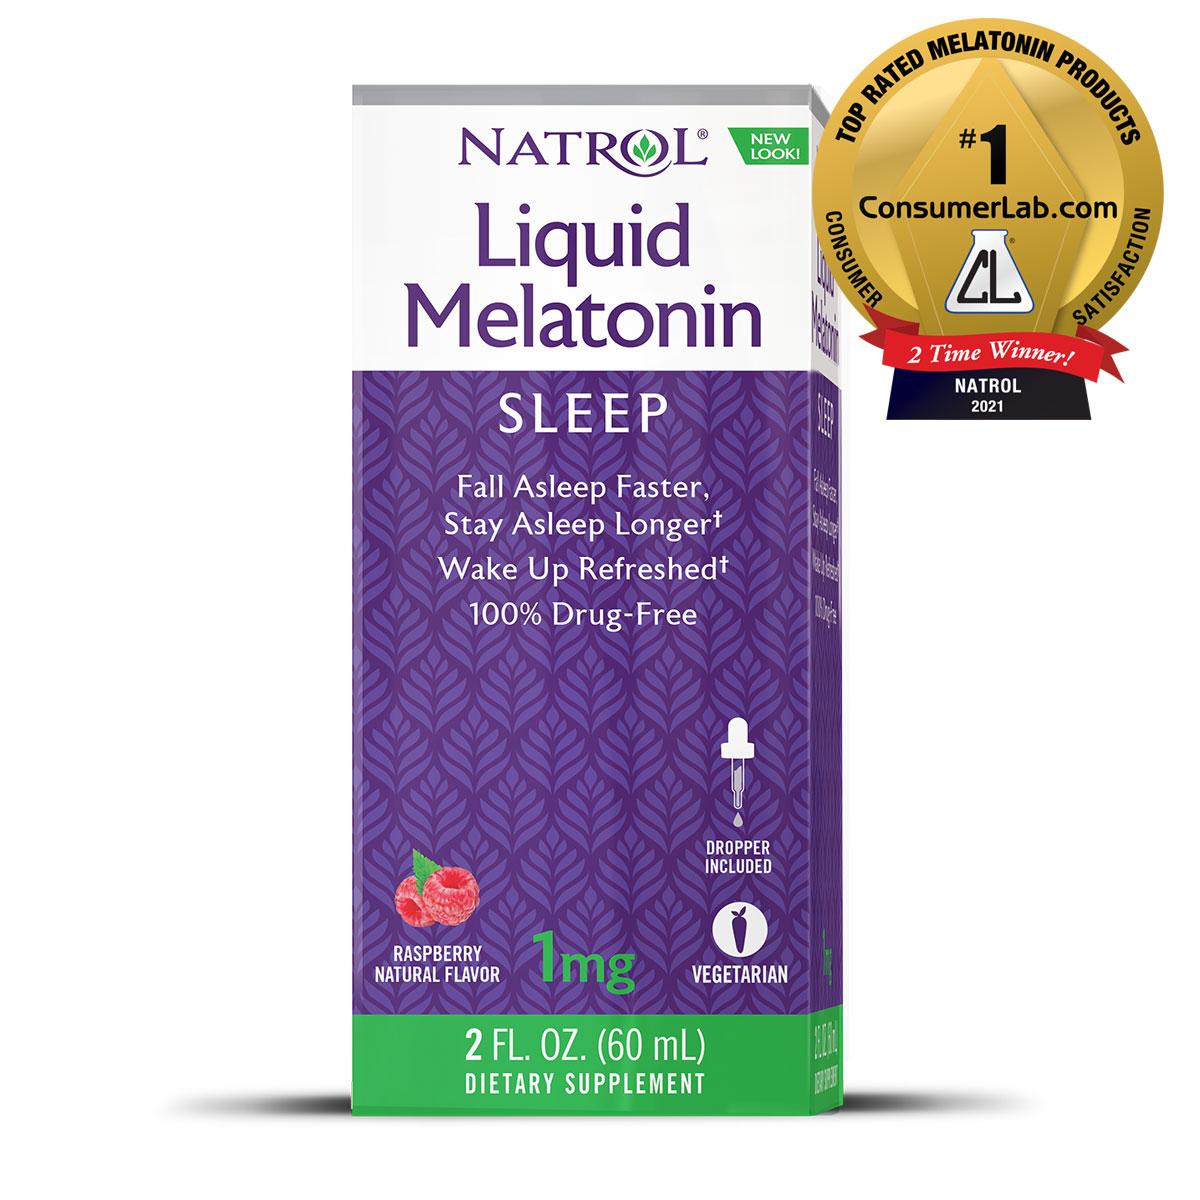 Natrol Liquid Melatonin